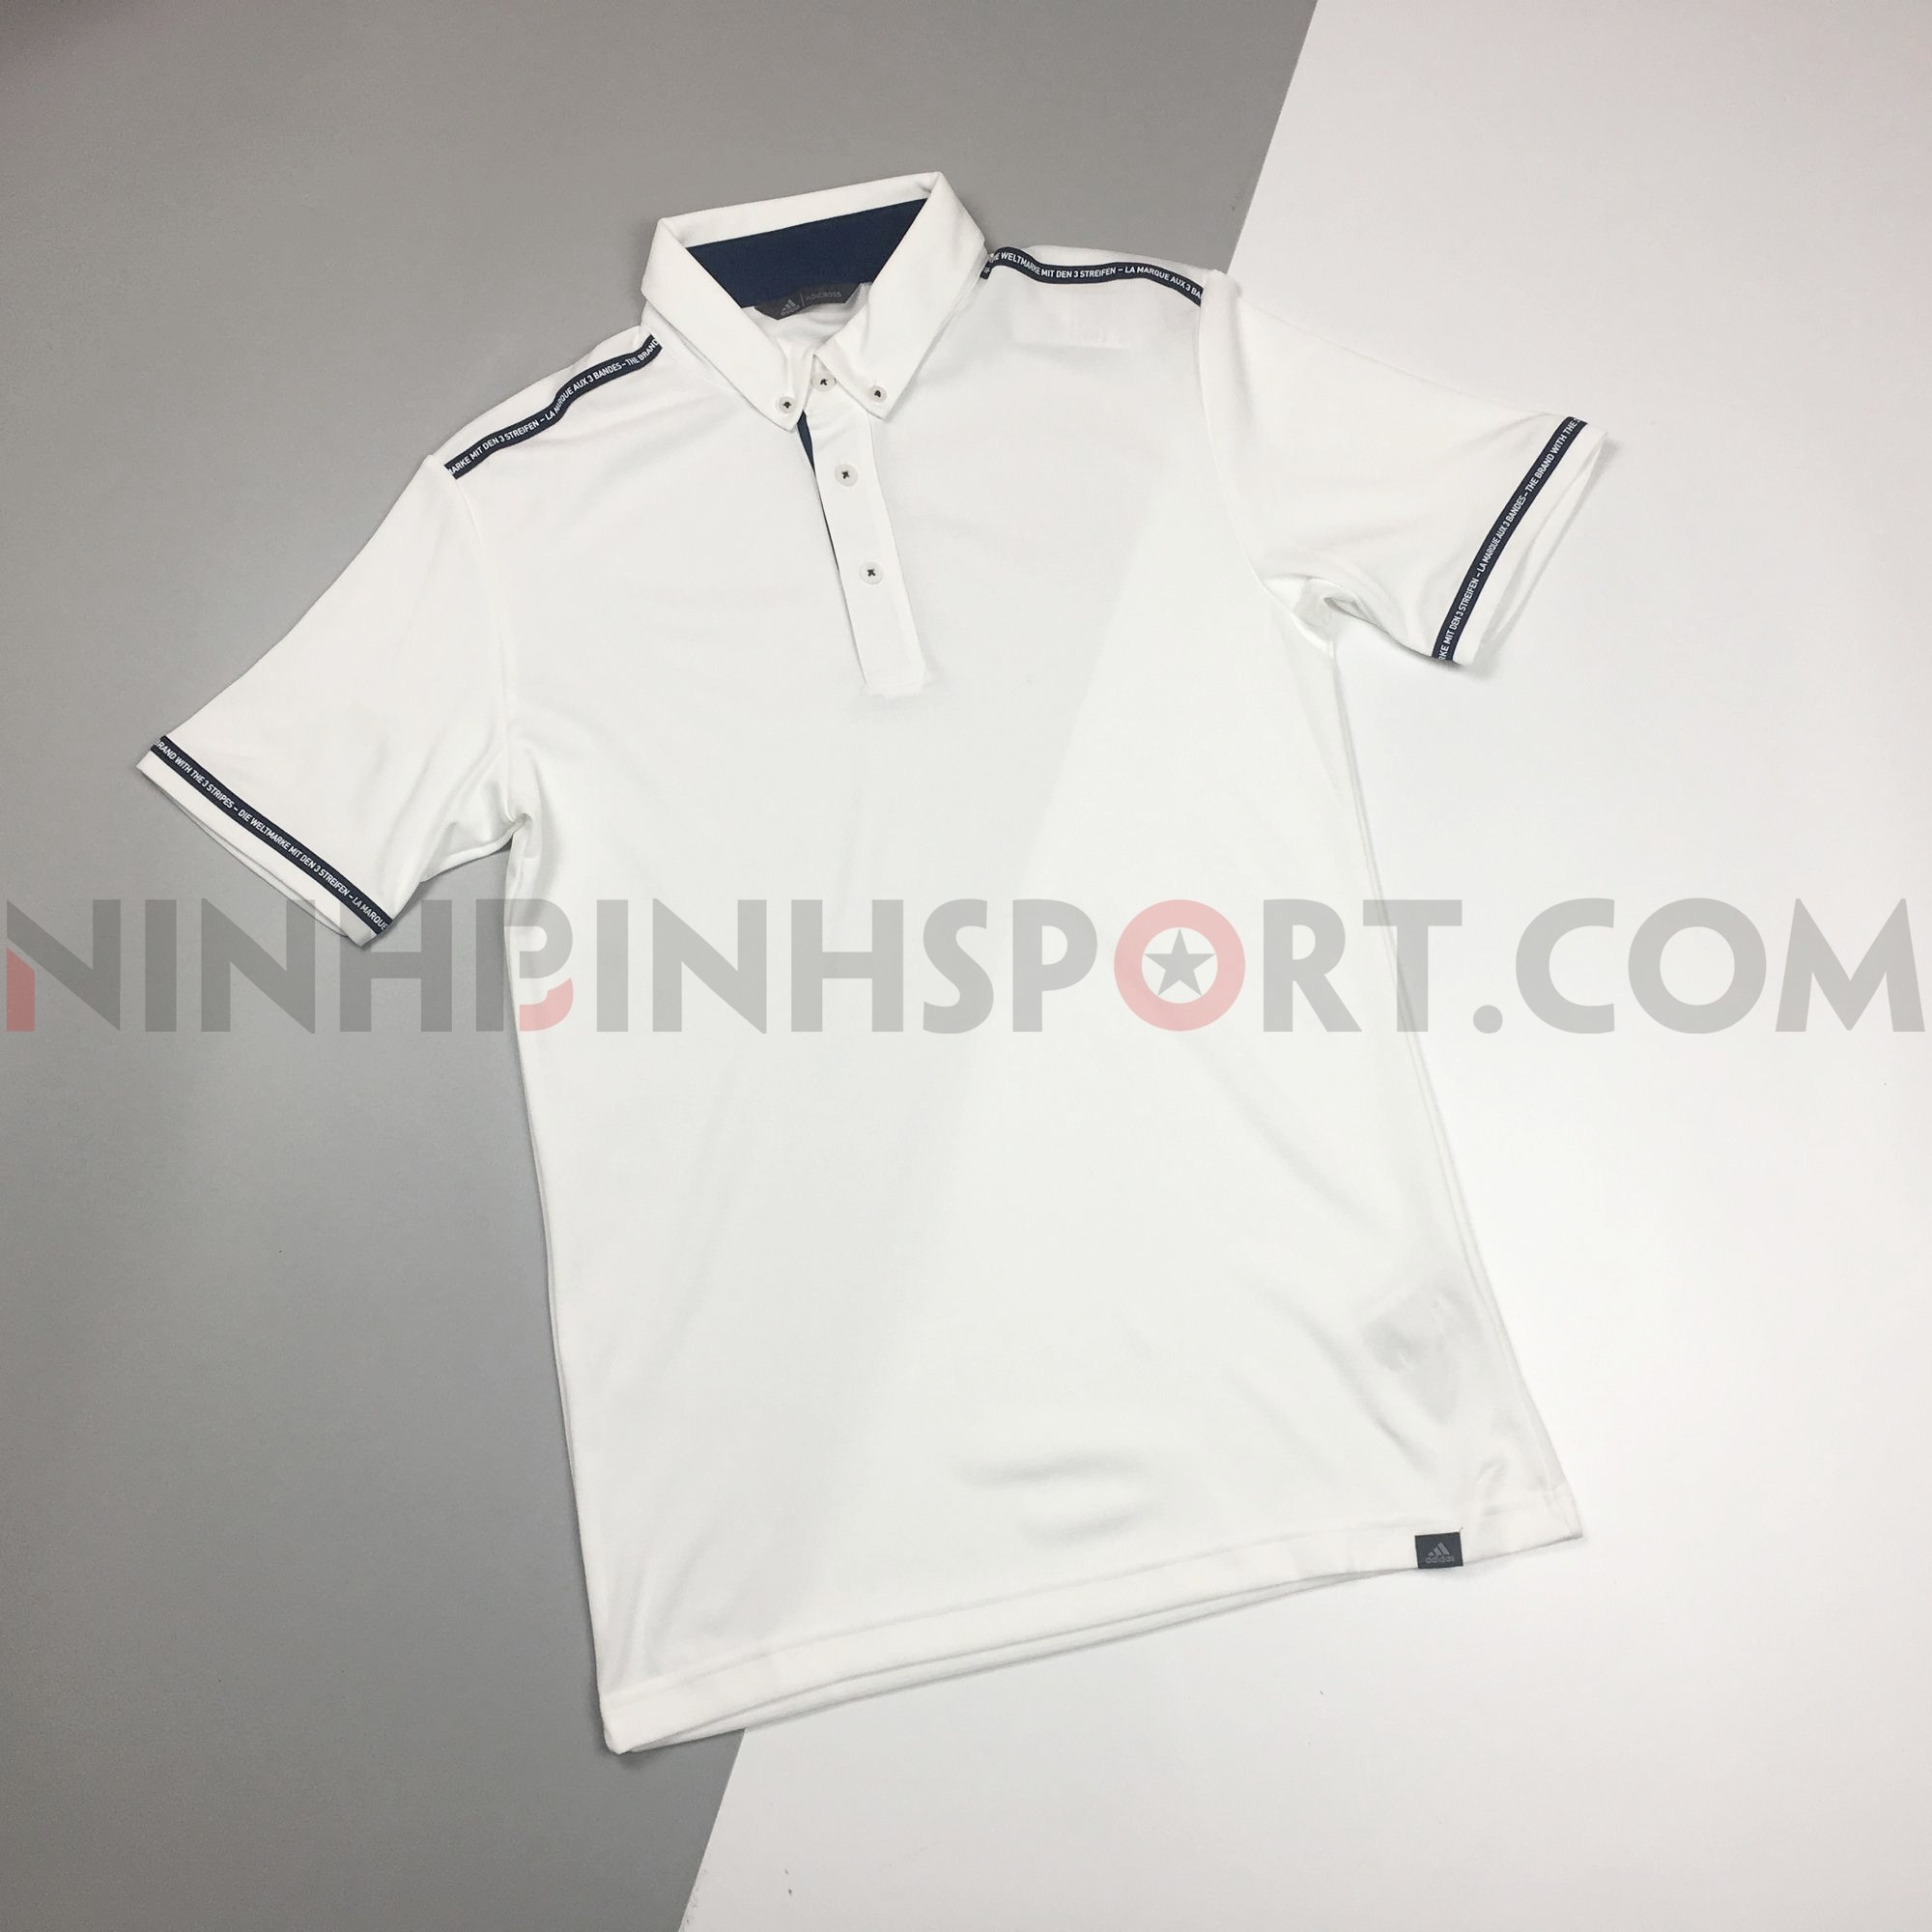 Áo thể thao nam Adidas Golf Adicross Polo Shirt - White DW5797